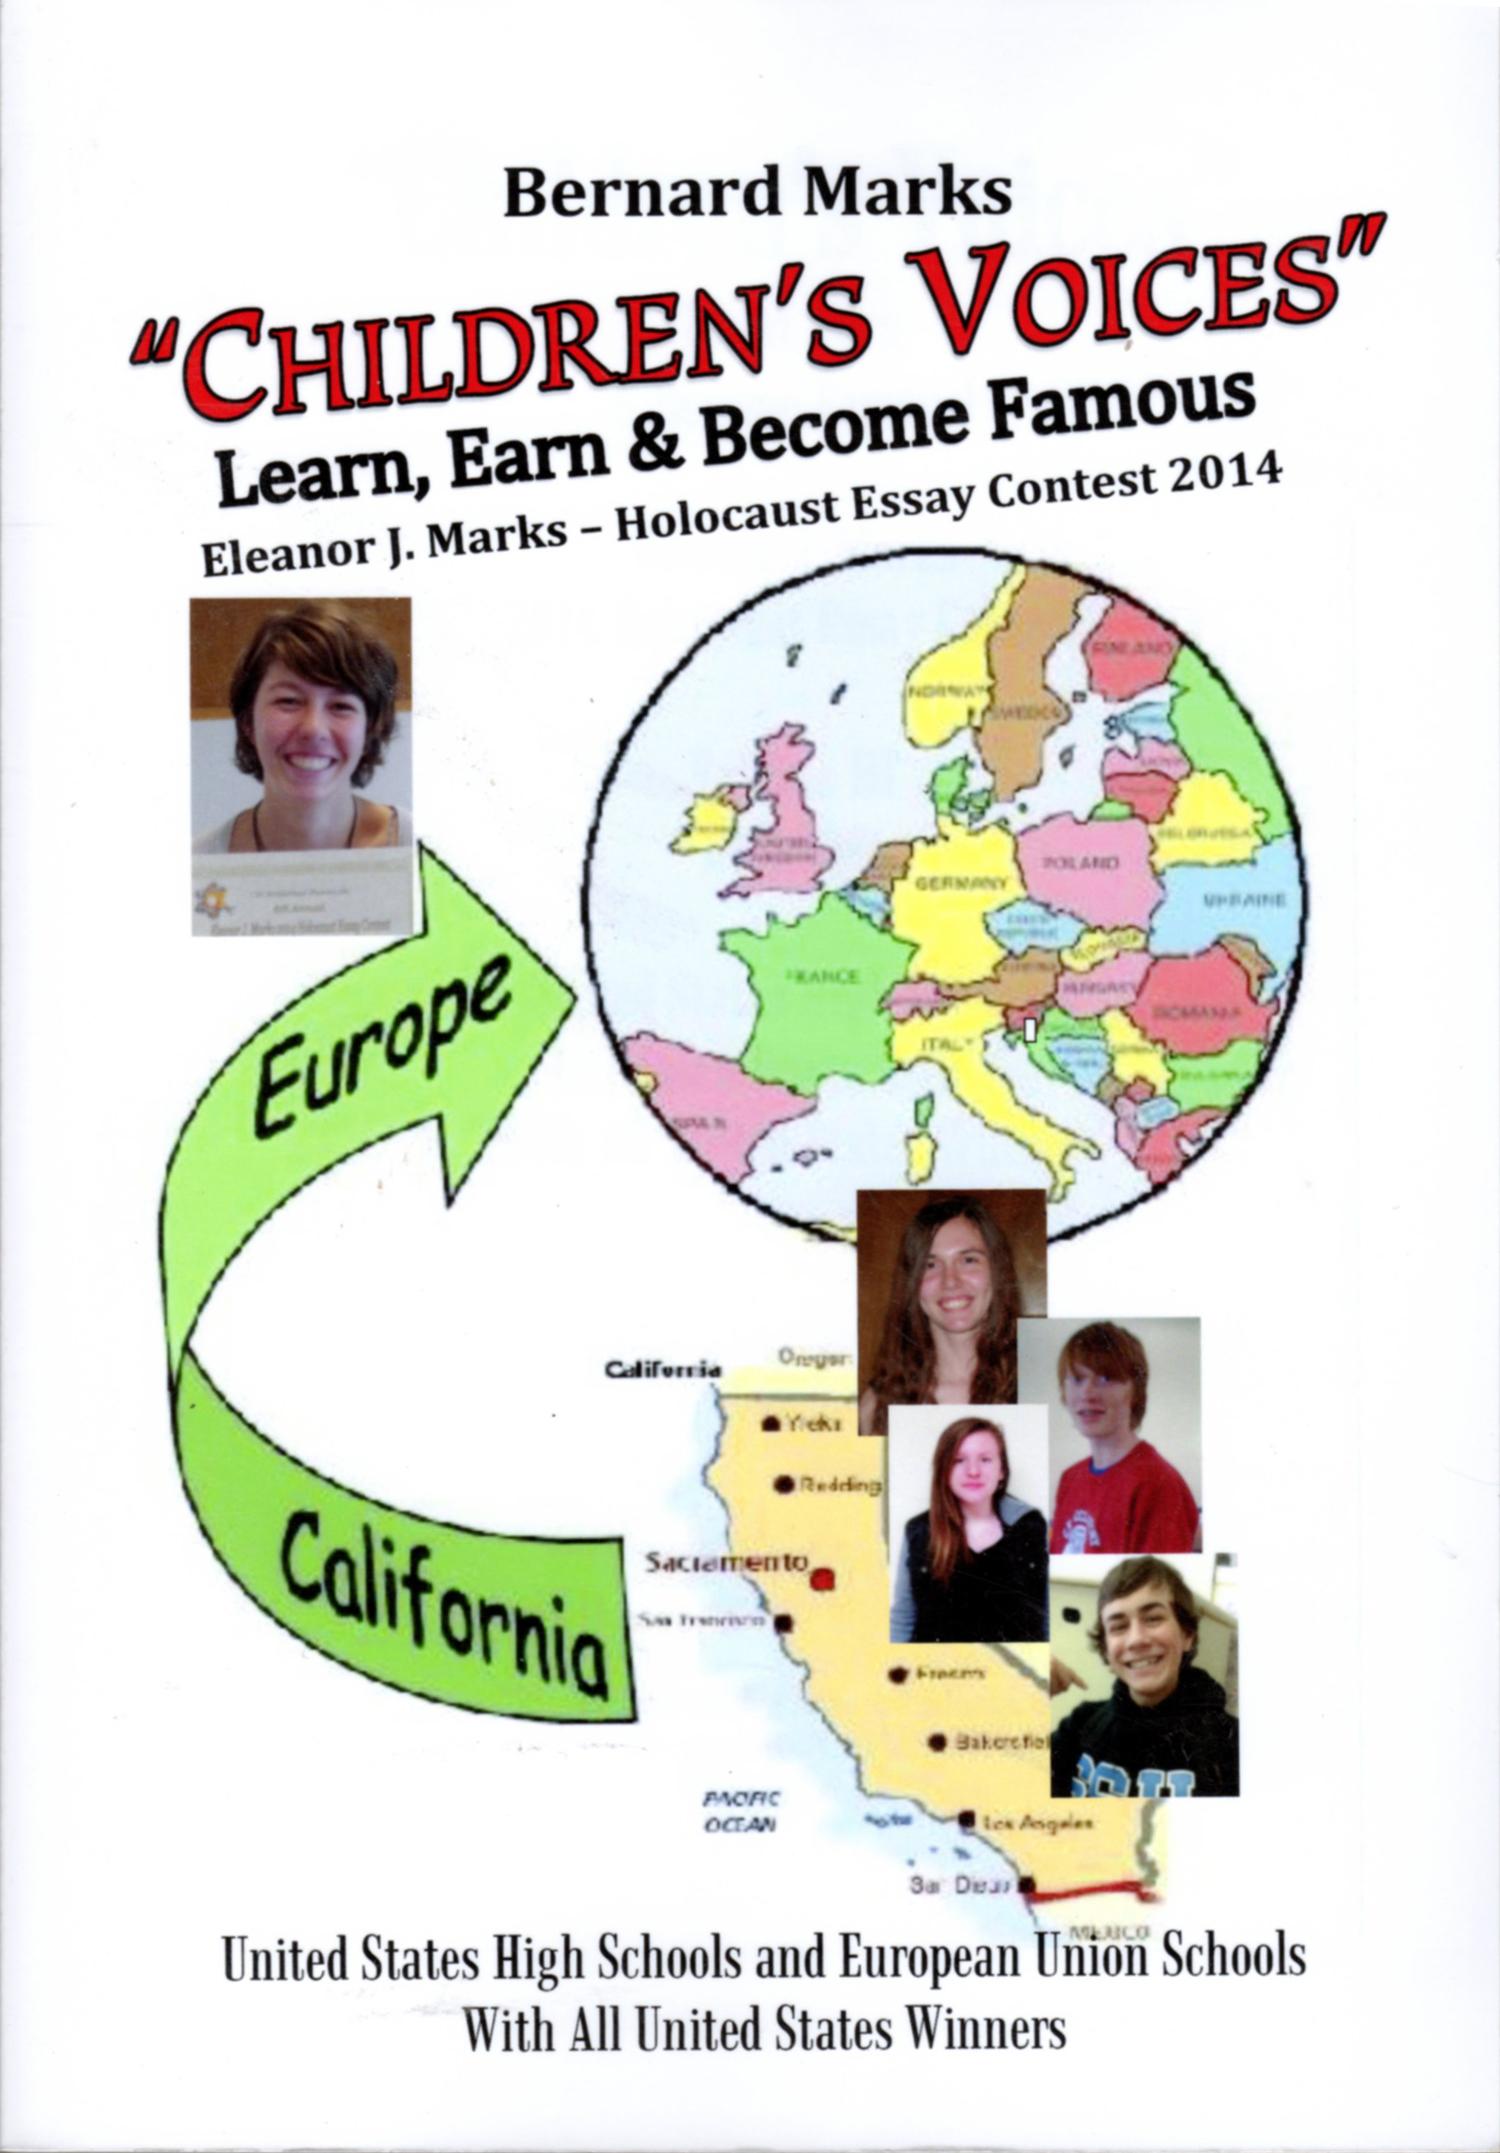 ChildrensVoices2014-BOOK2-USHighschools-EuropeanUnionSchools-allWinners.jpg